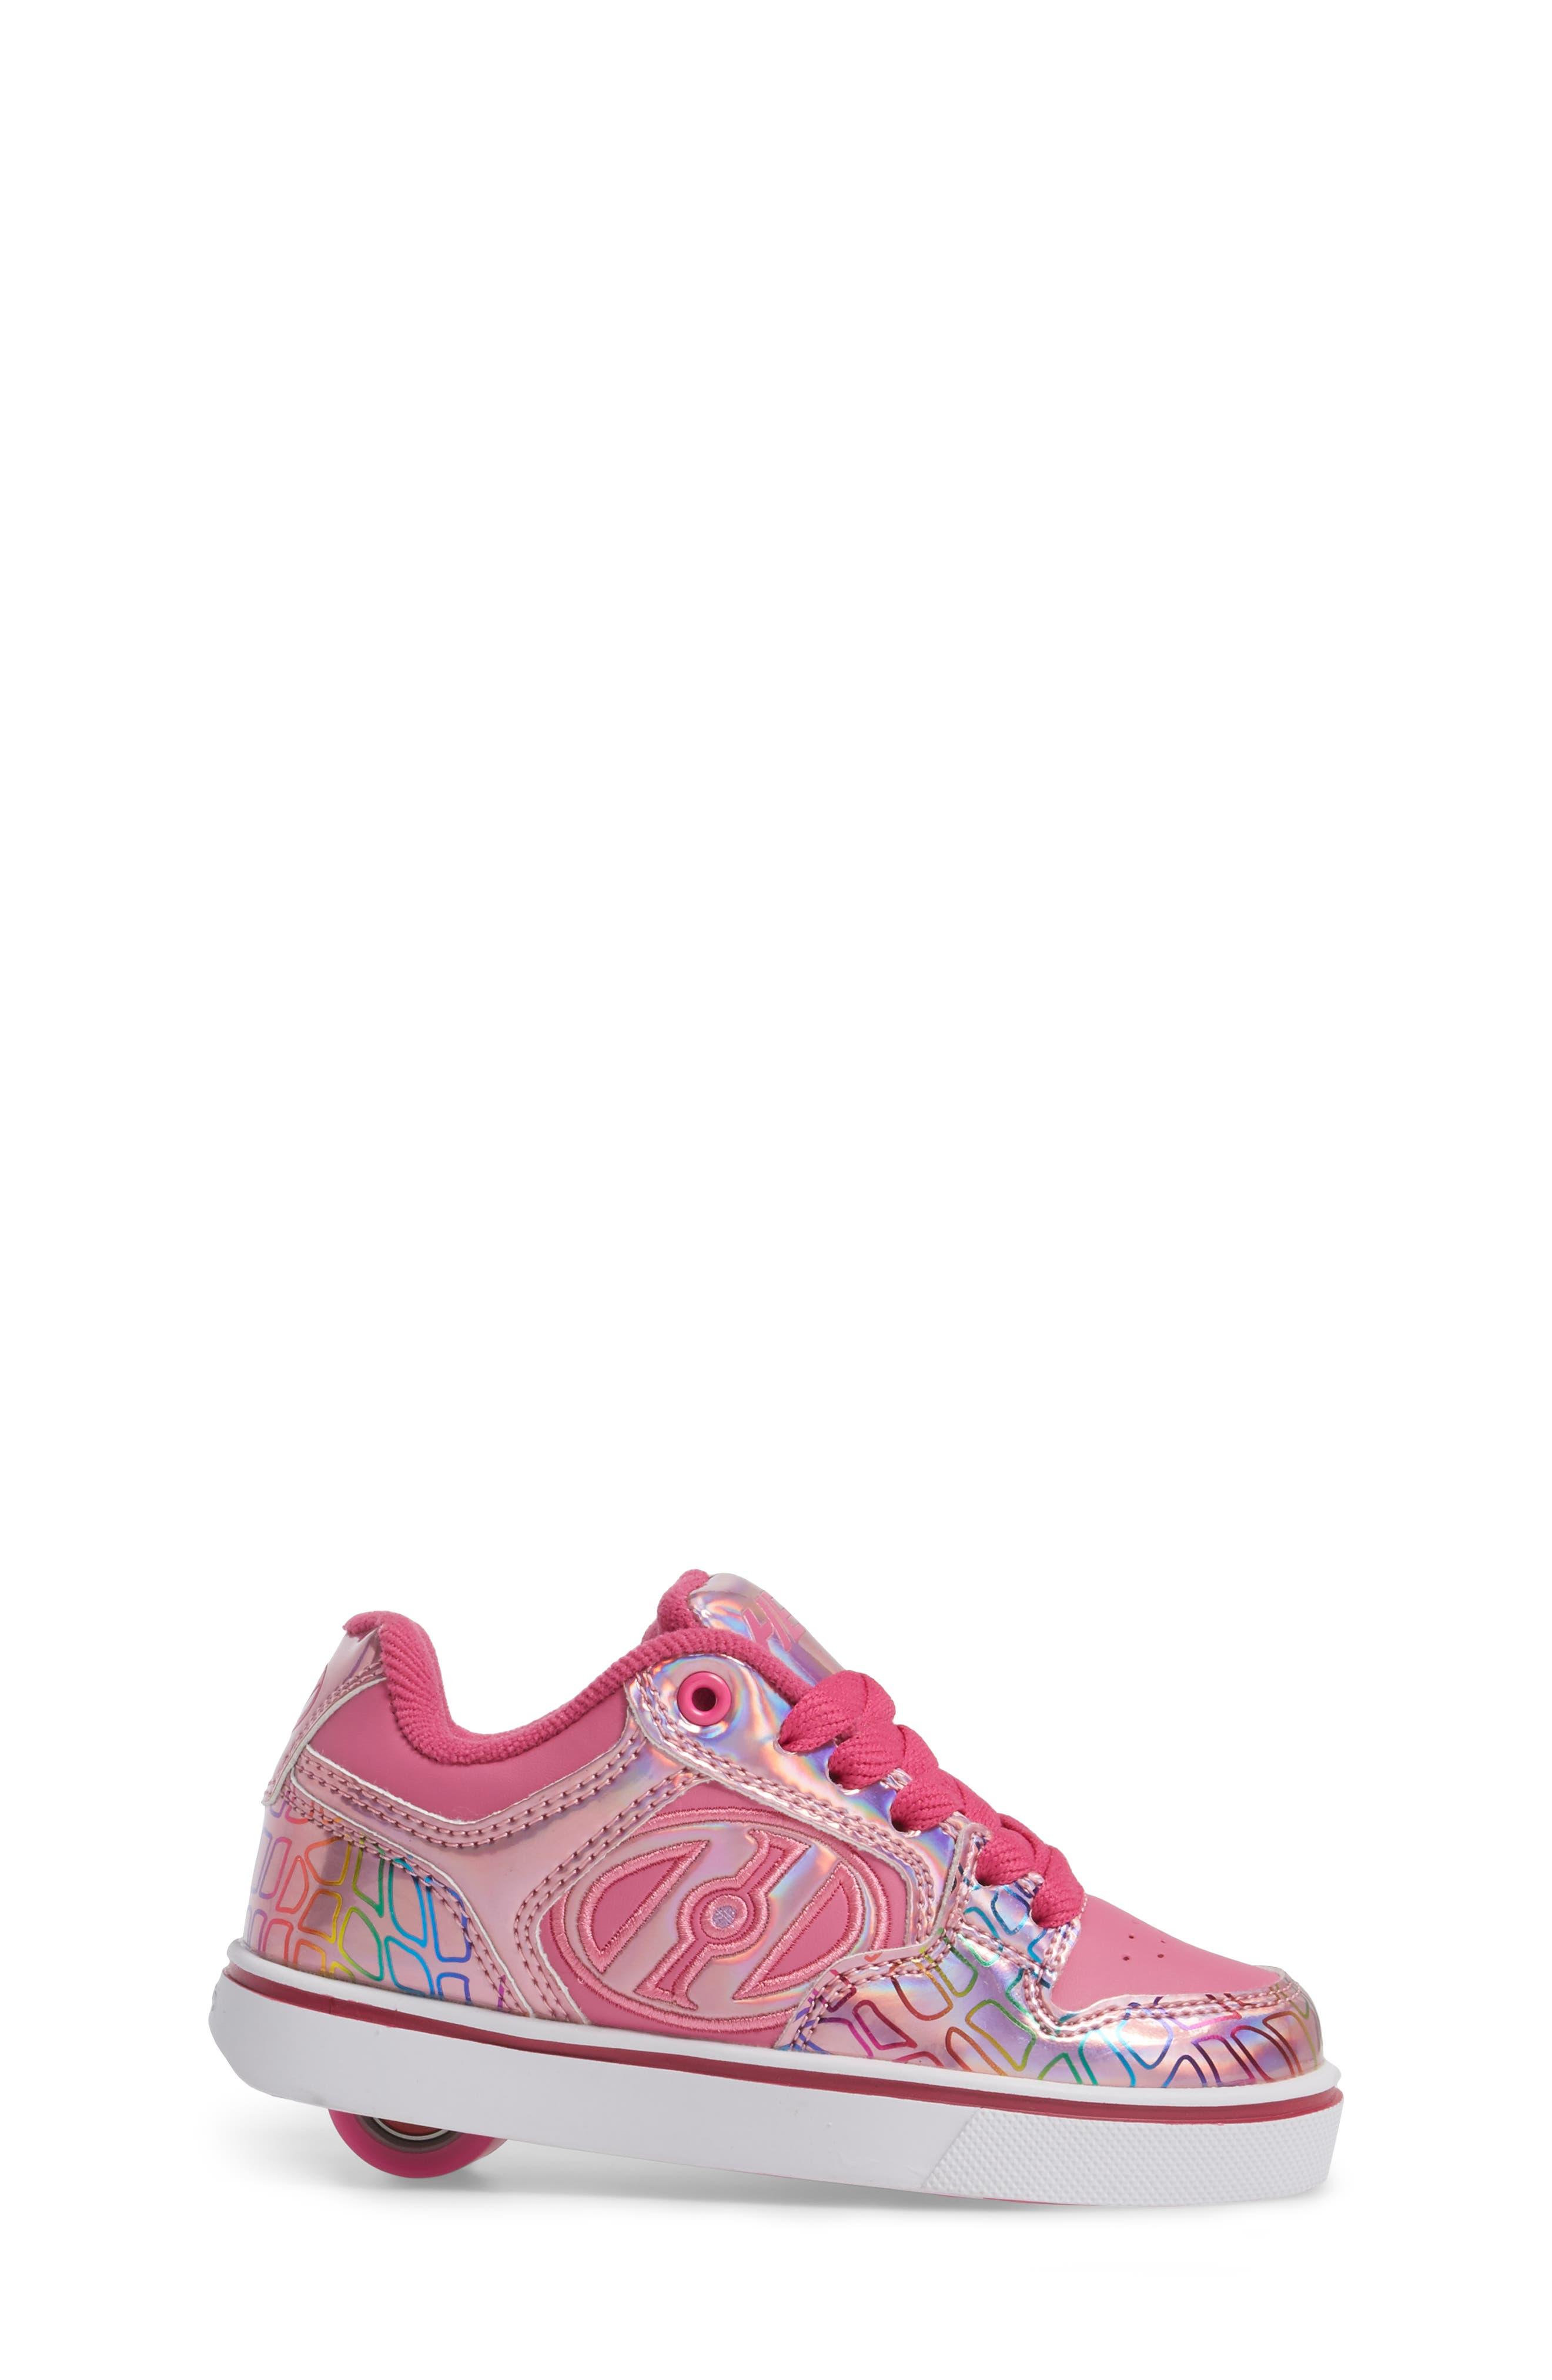 Motion Plus Skate Sneaker,                             Alternate thumbnail 3, color,                             PINK/ LIGHT PINK